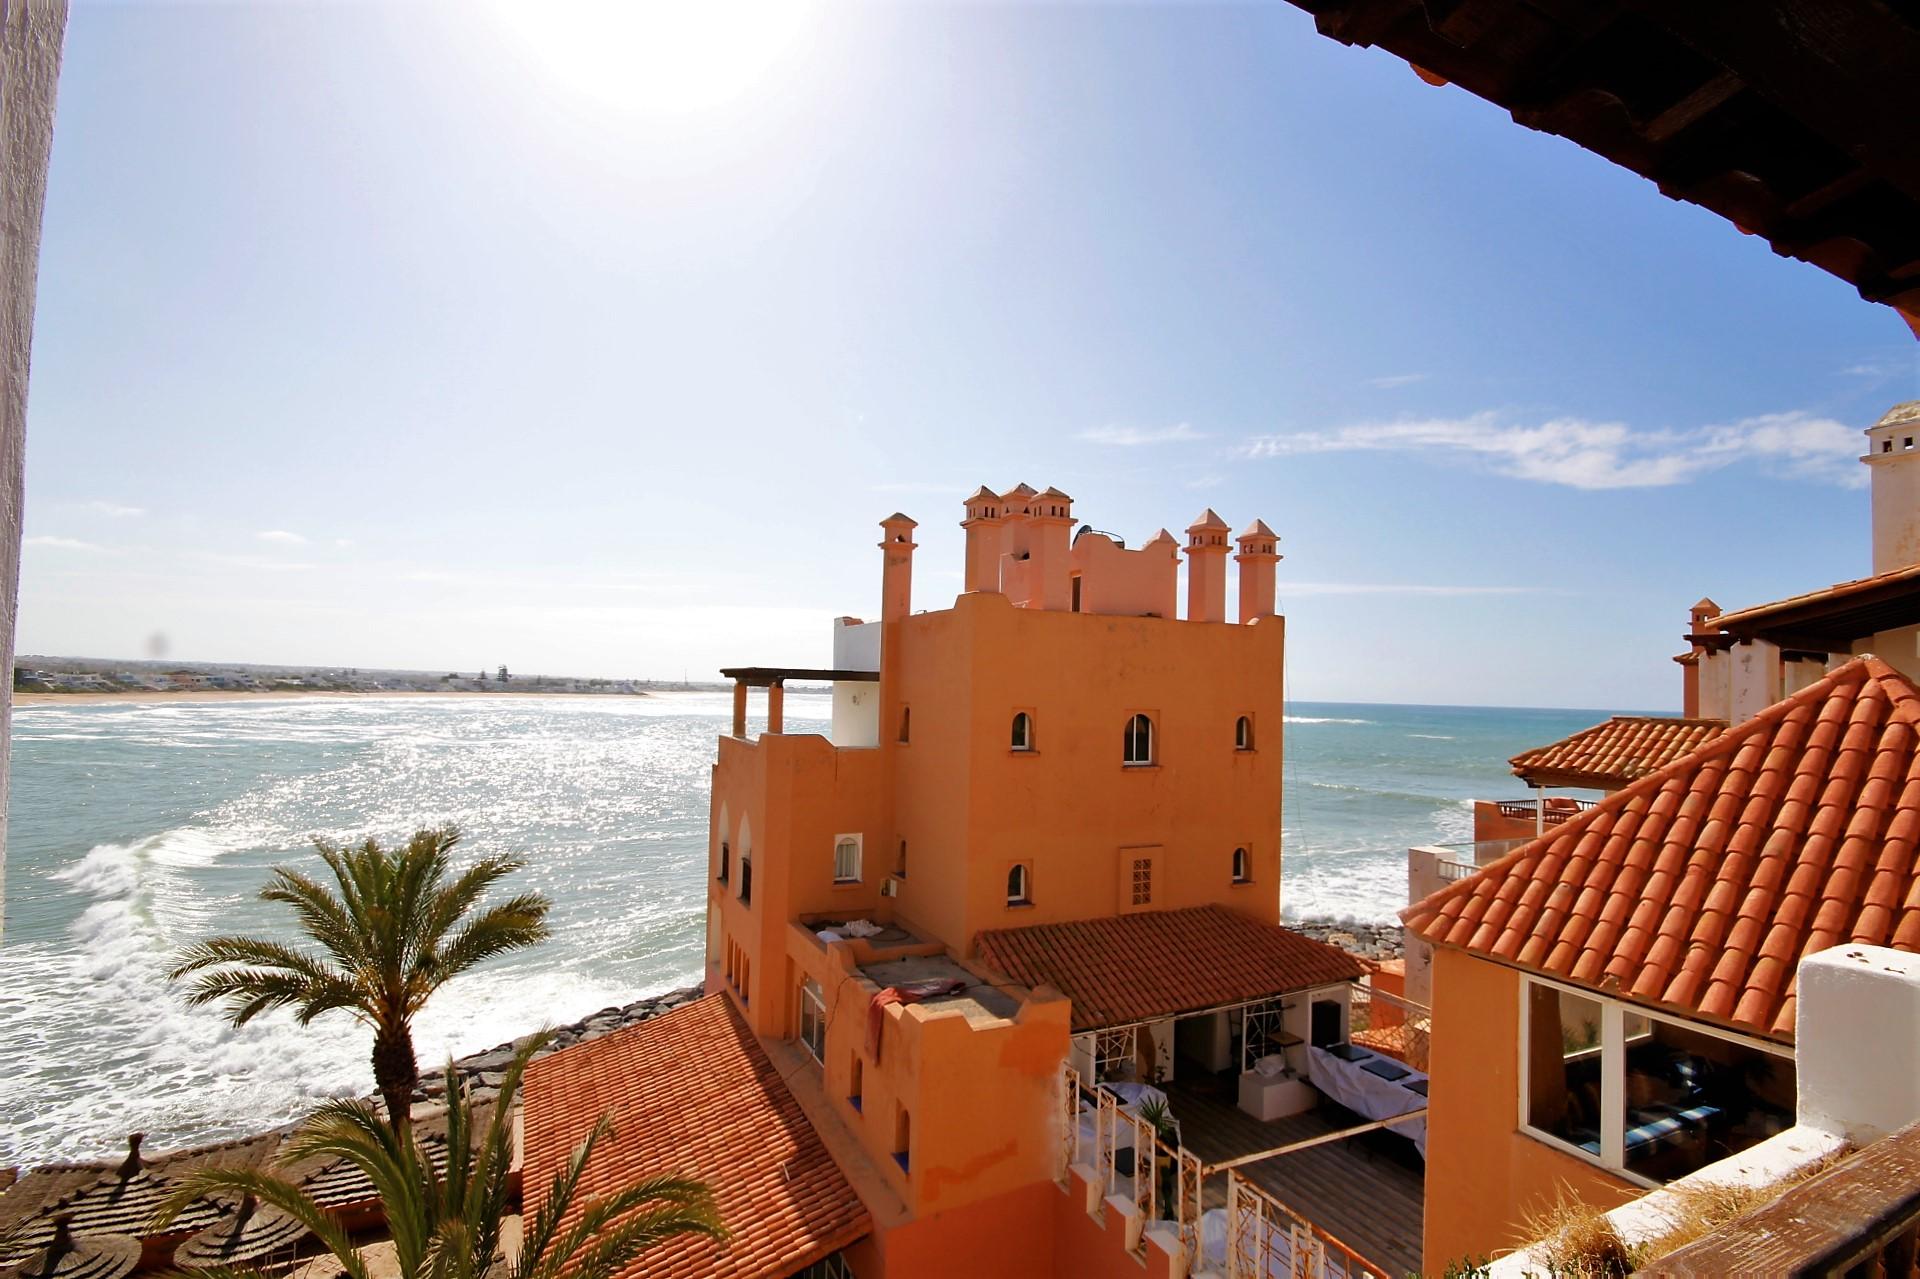 Maroc, Bouznika (Bay), vend appart 2 CHAMBRES avec terrasse vue mer